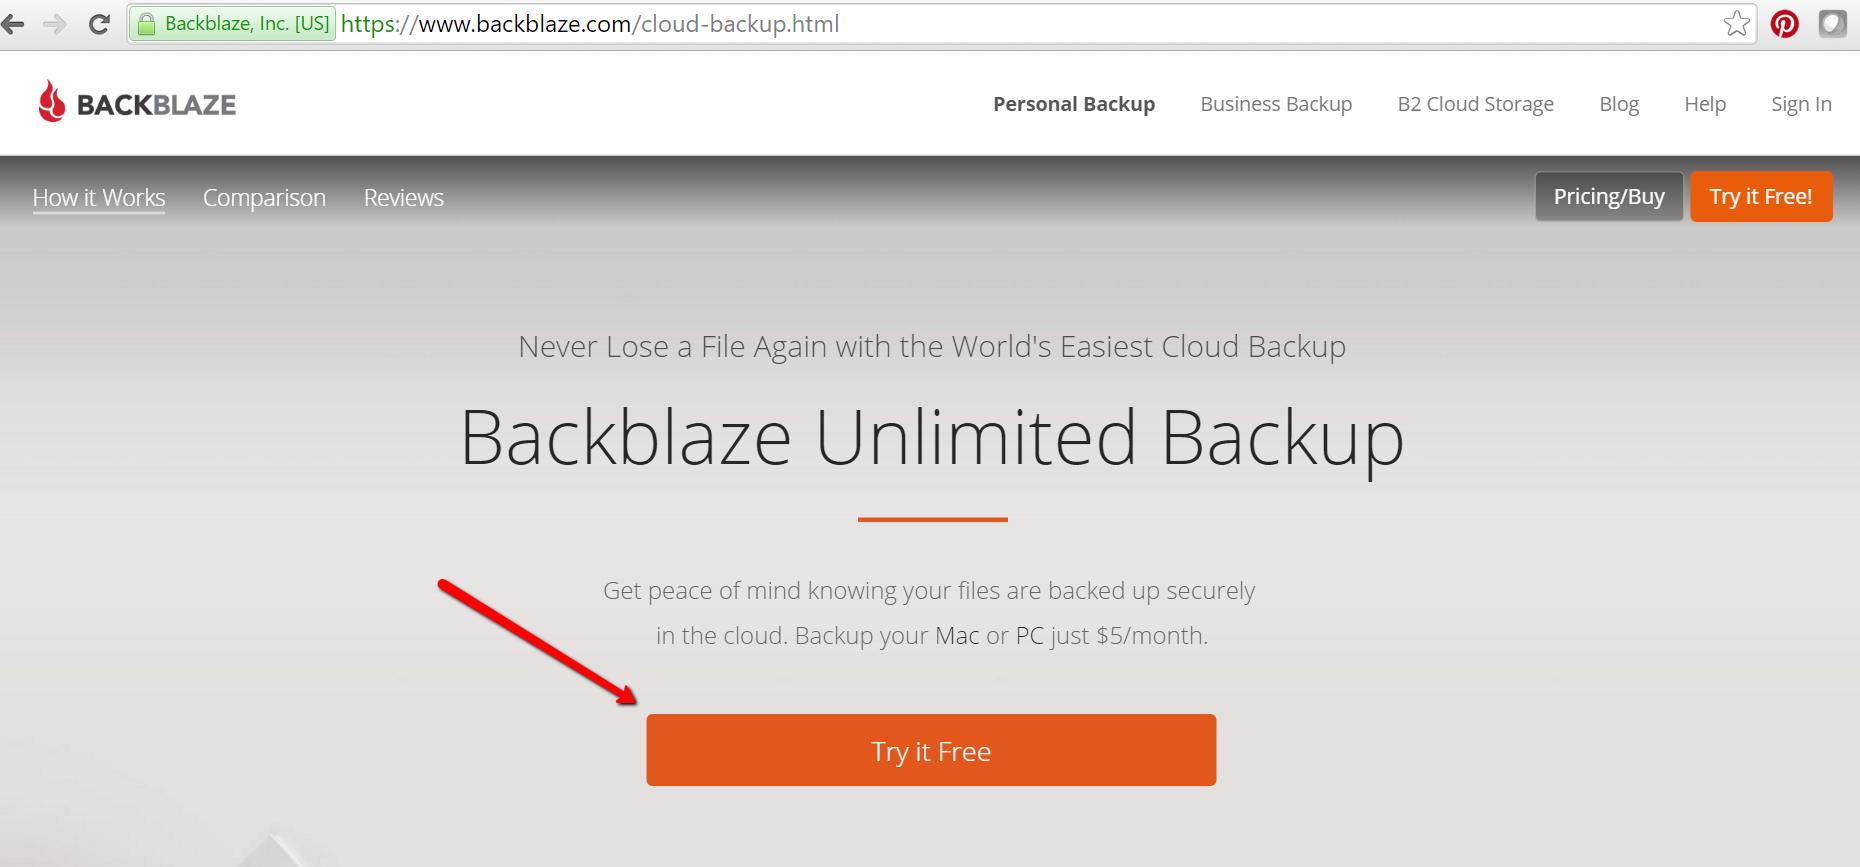 How to Download Backblaze in 4 Easy Steps | Genealogy Gems